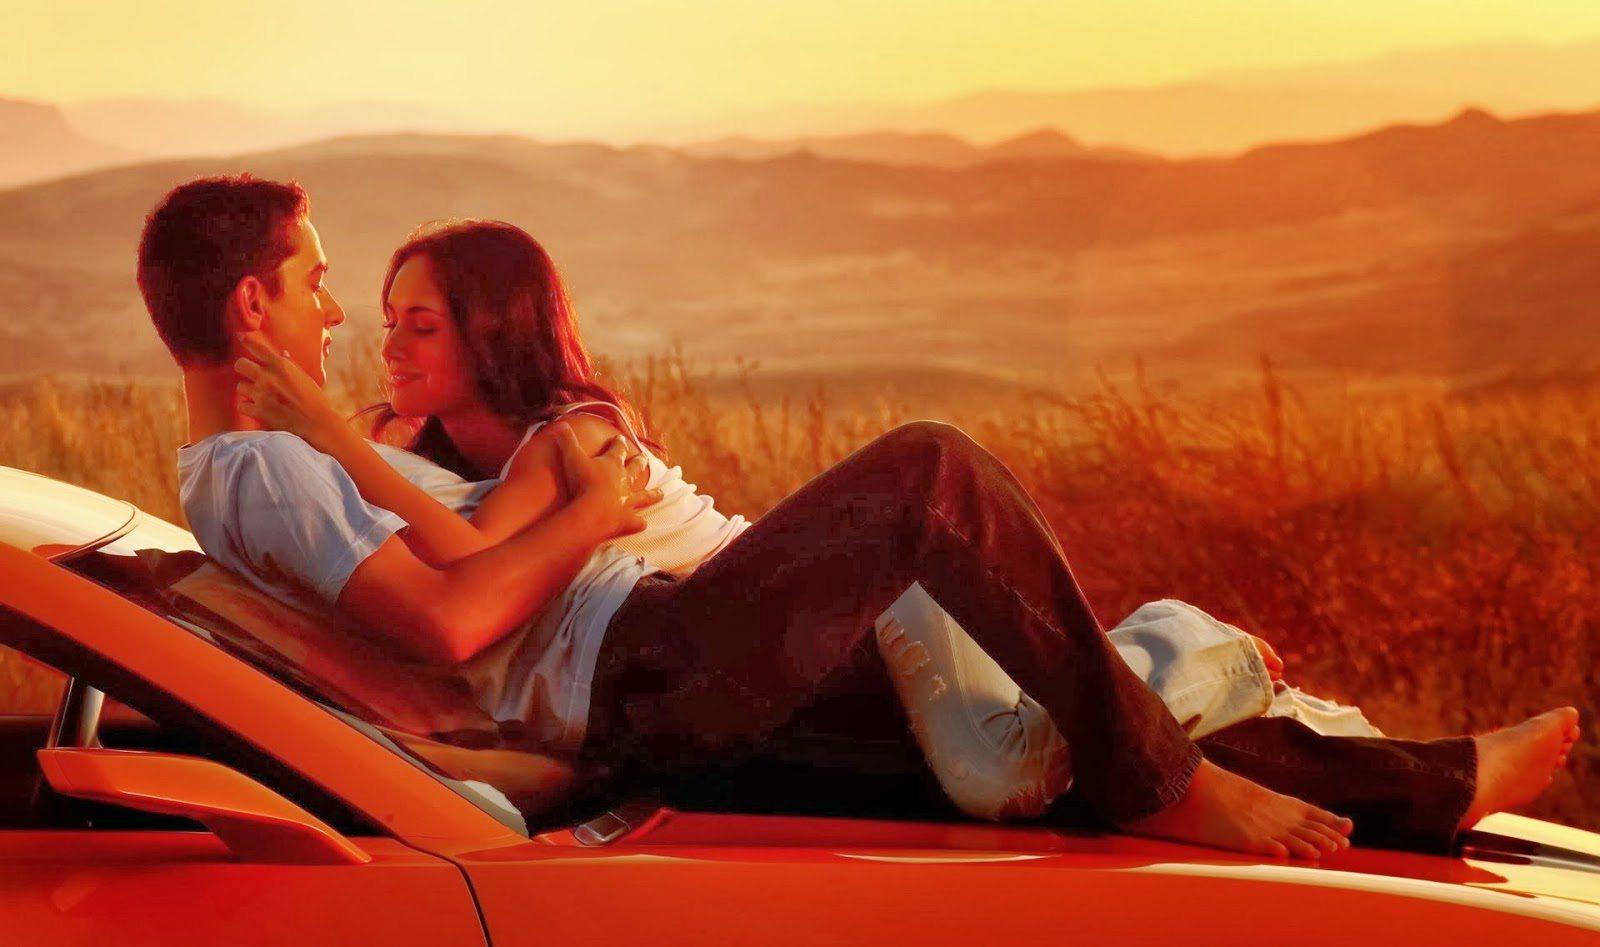 эротичиски романтик фото бесплатно